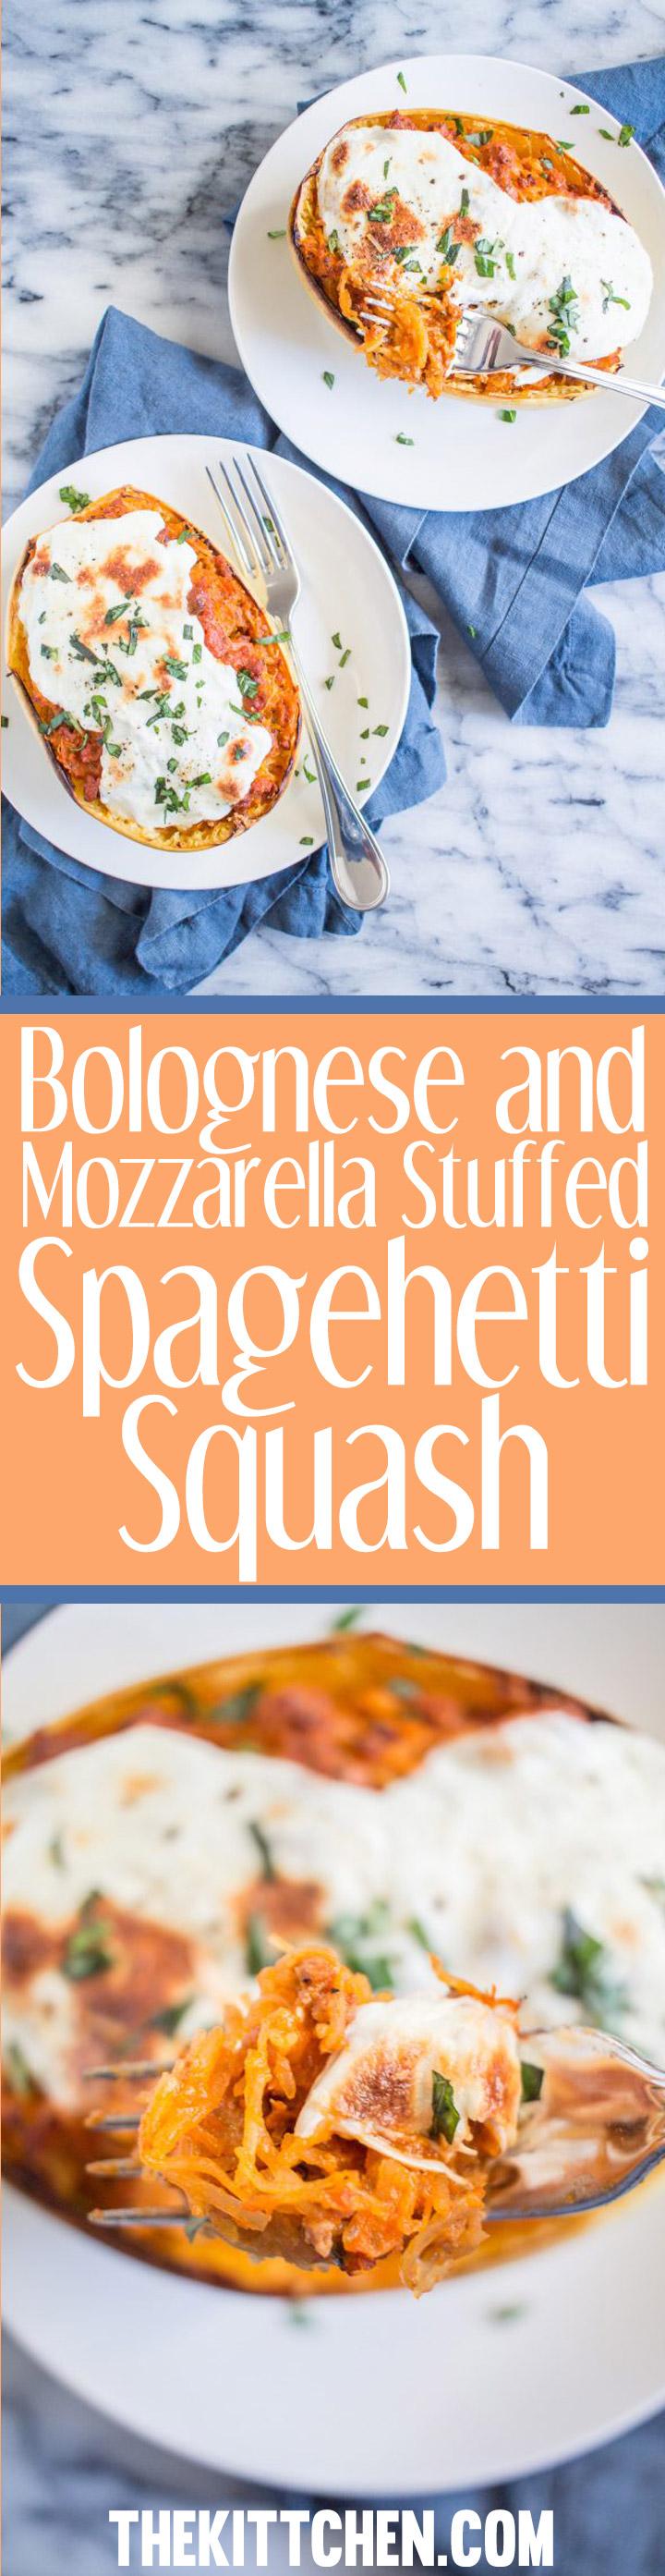 Bolognese and mozzarella stuffed spaghetti squash for Things to do with spaghetti squash